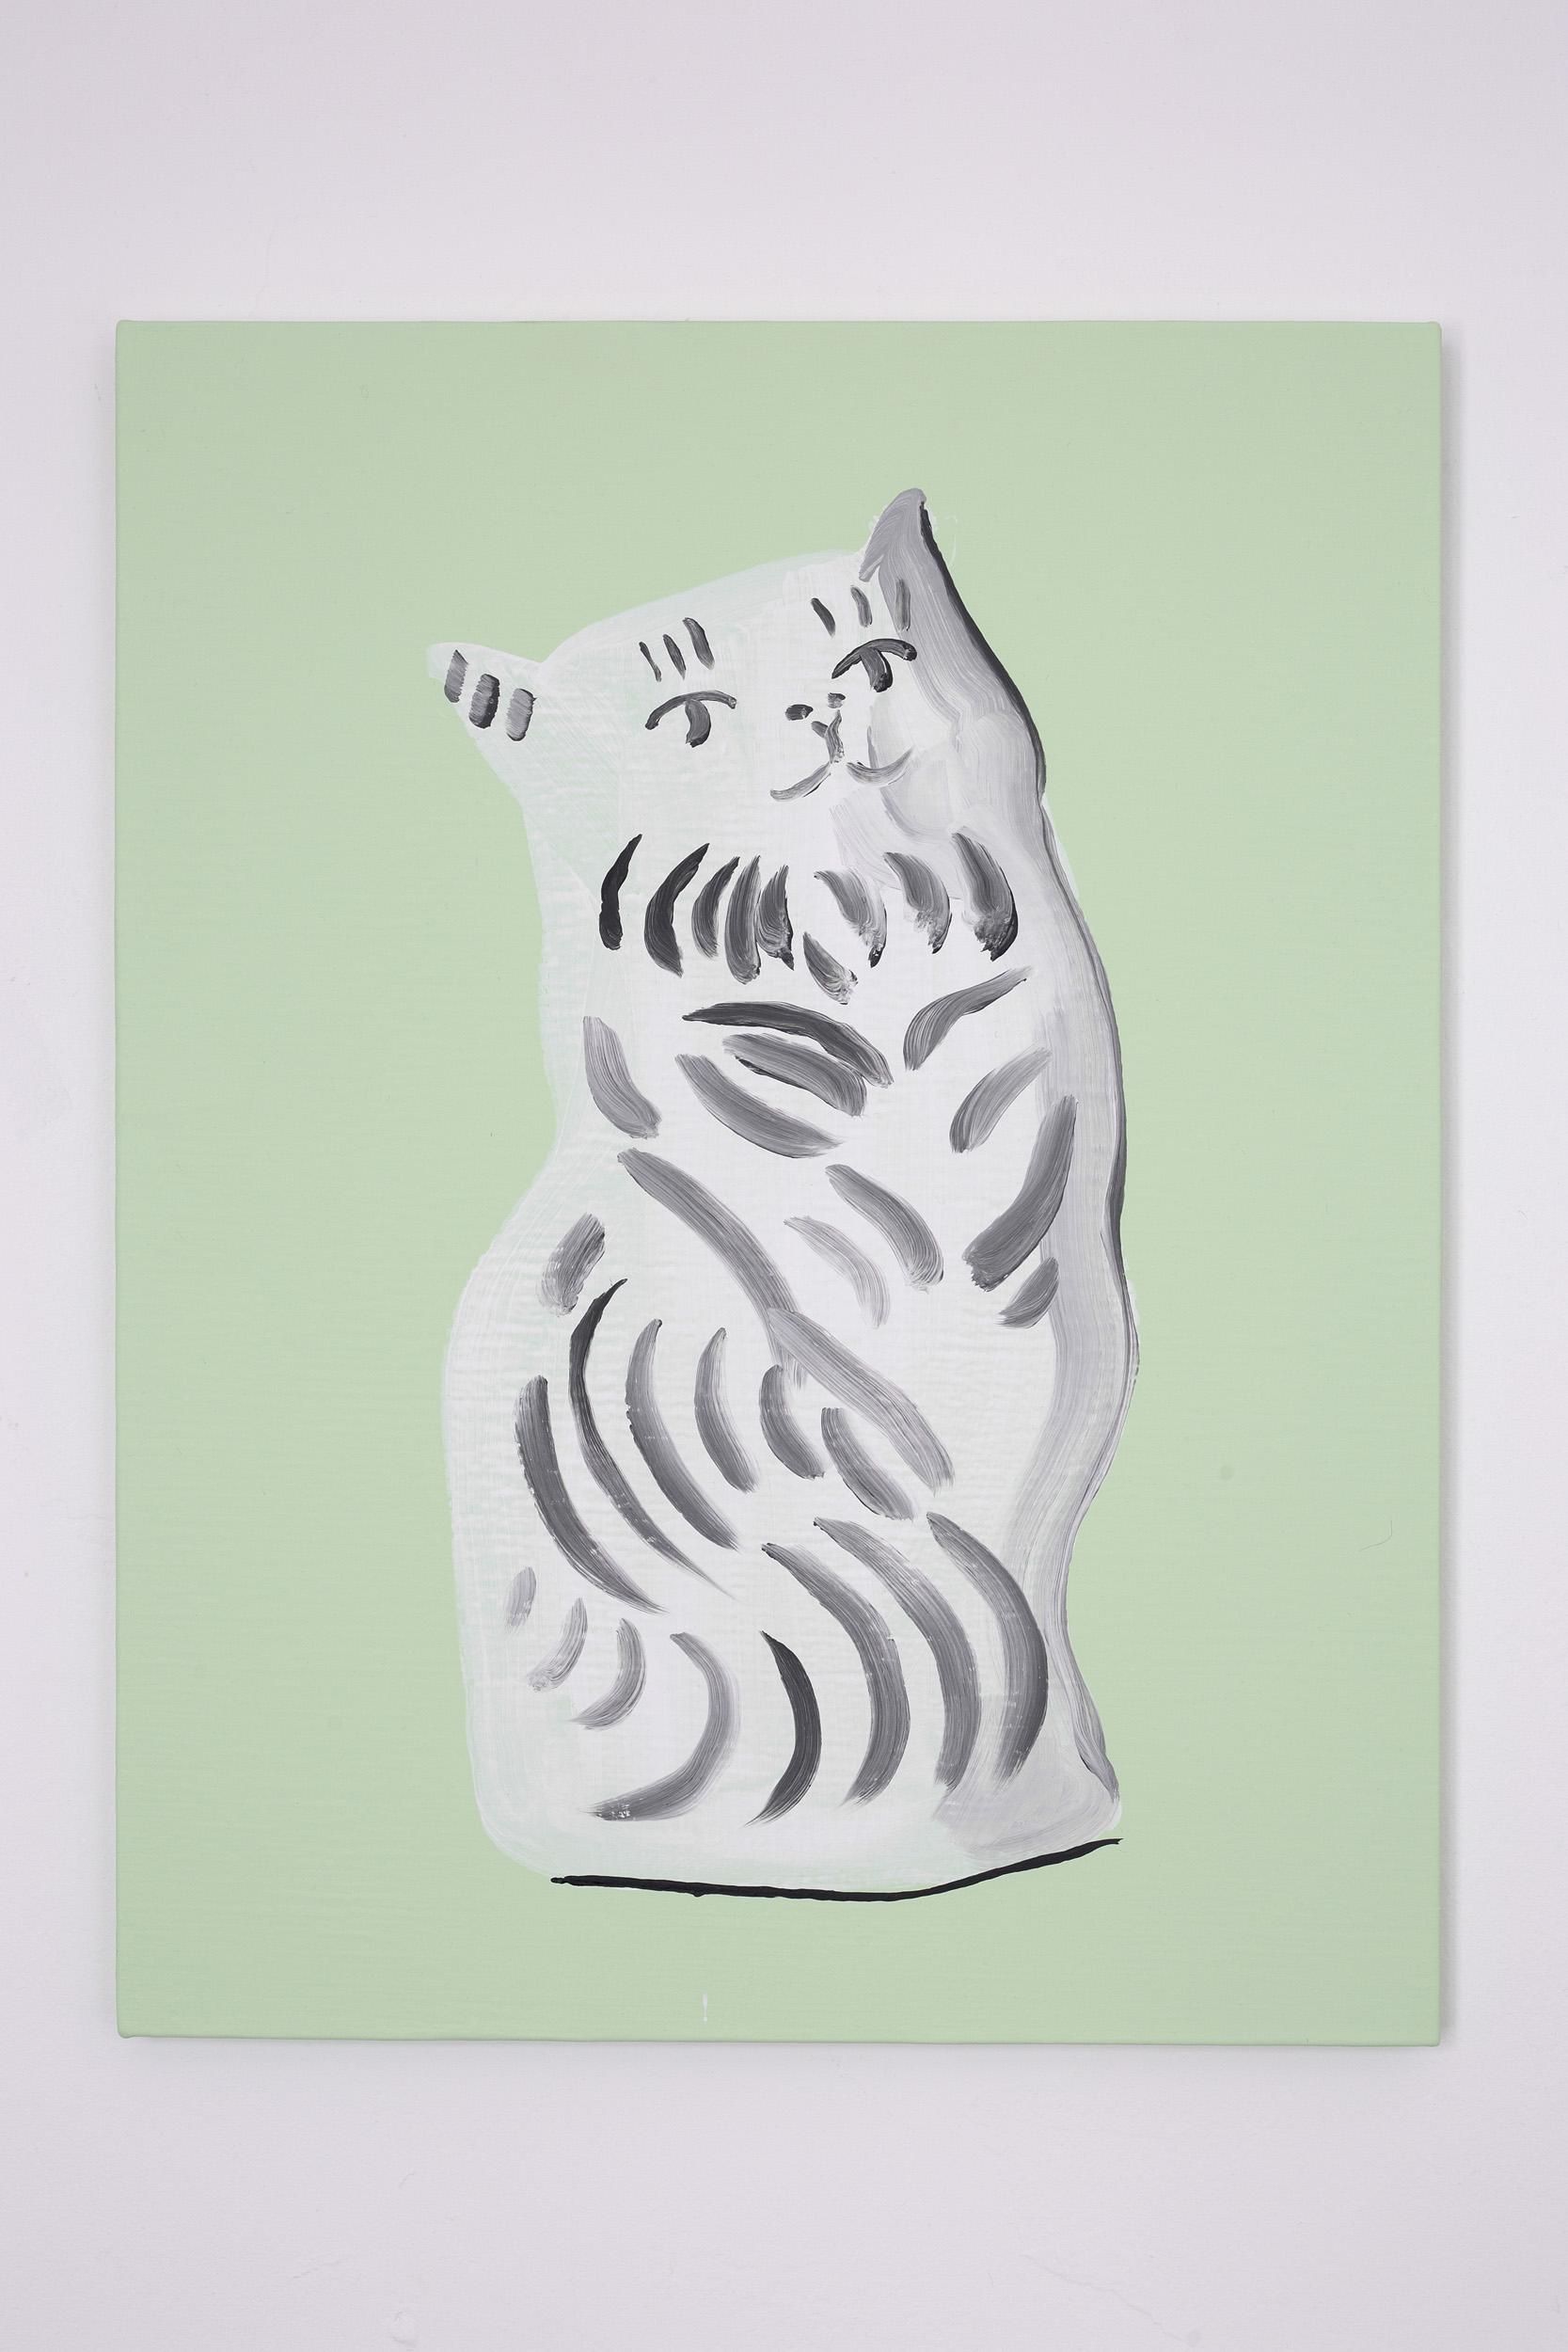 Shimon Minamikawa  (Various) Cat (Figurines),  2019. Acrylic on canvas, 53.1 x 41cm